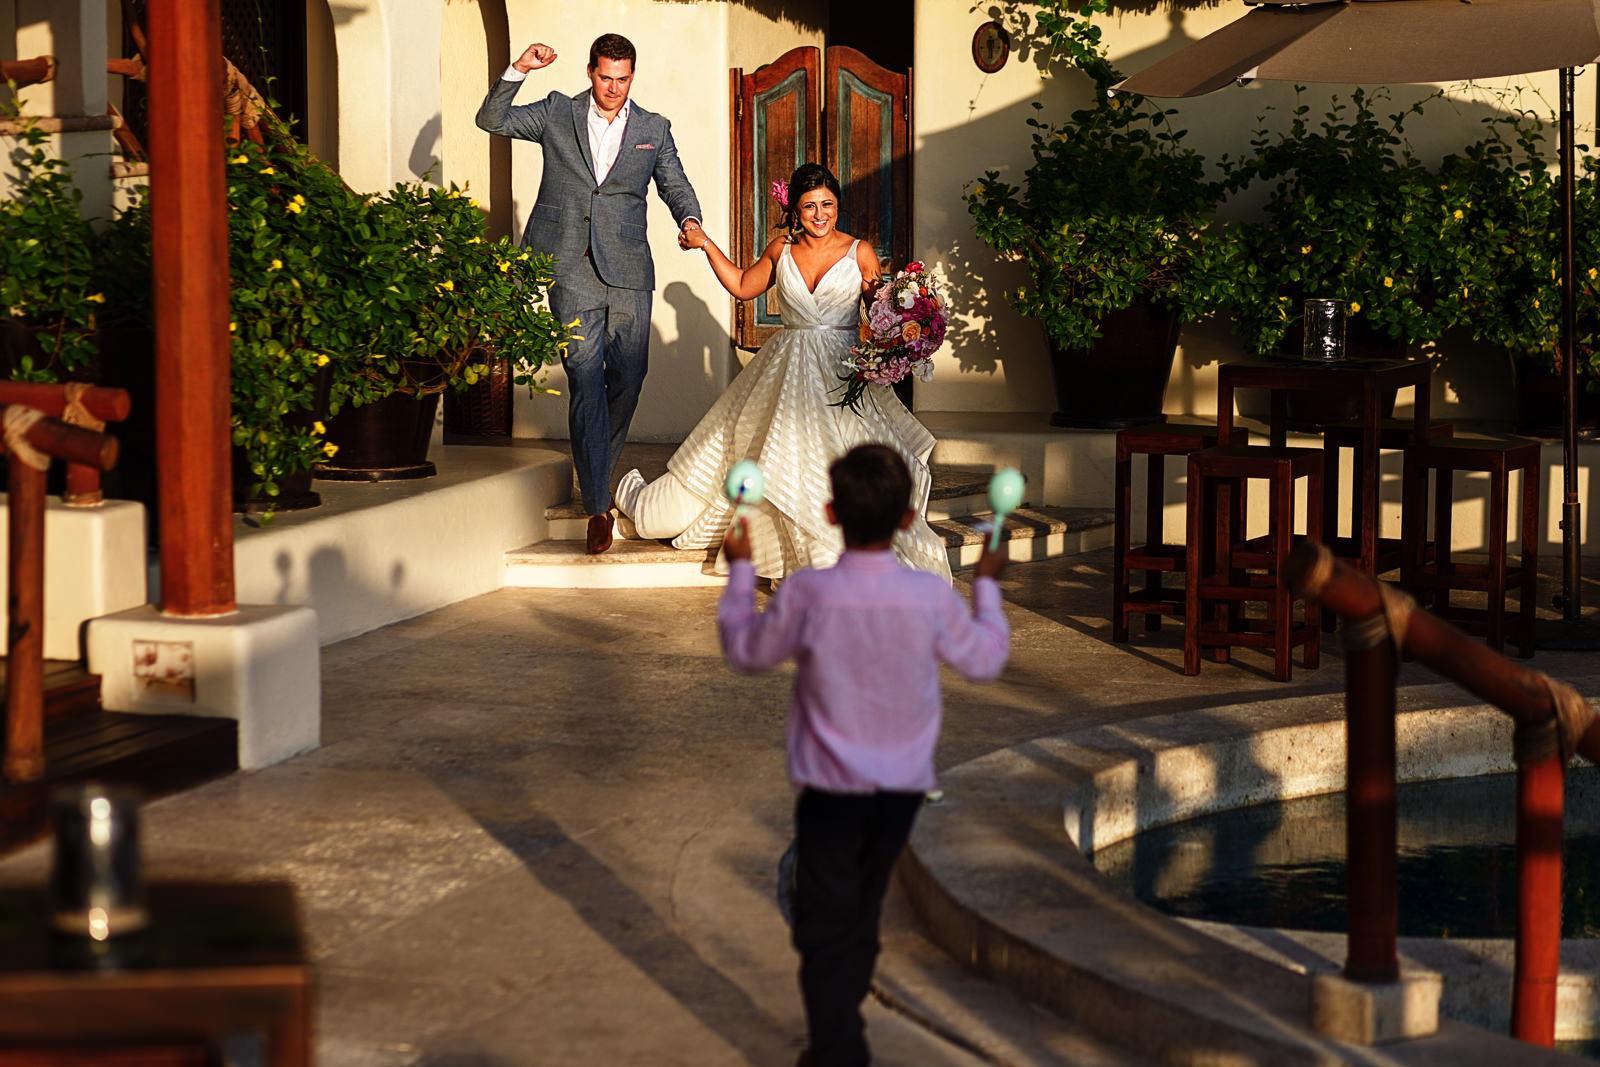 groom-bride-entrance-maraca-shake